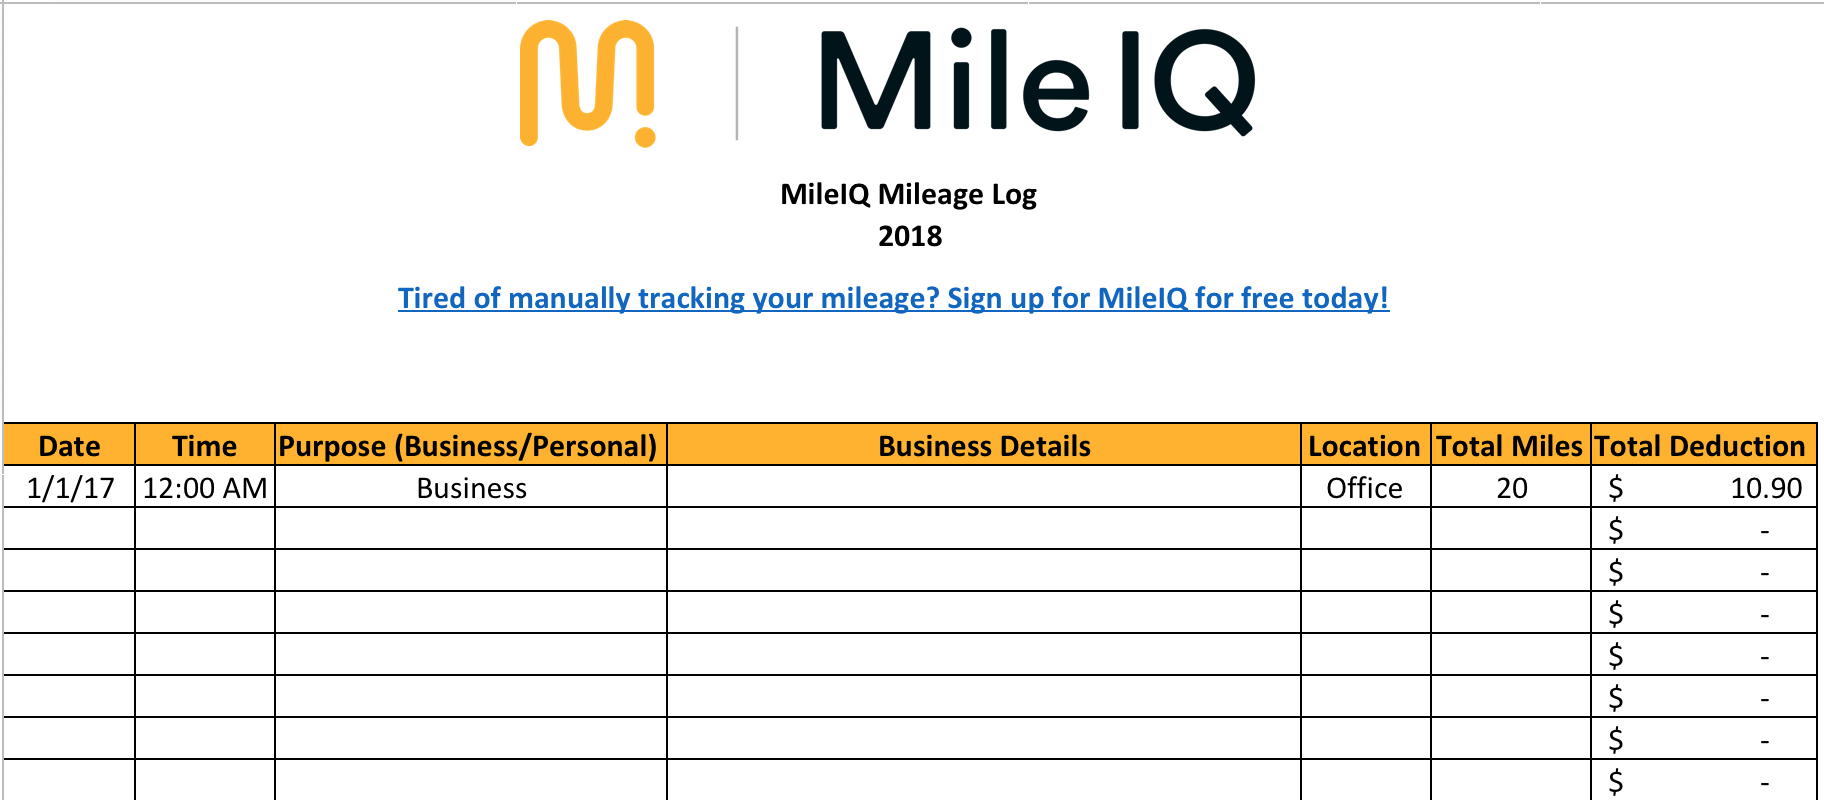 Gas Mileage Tracker Spreadsheet With Free Mileage Log